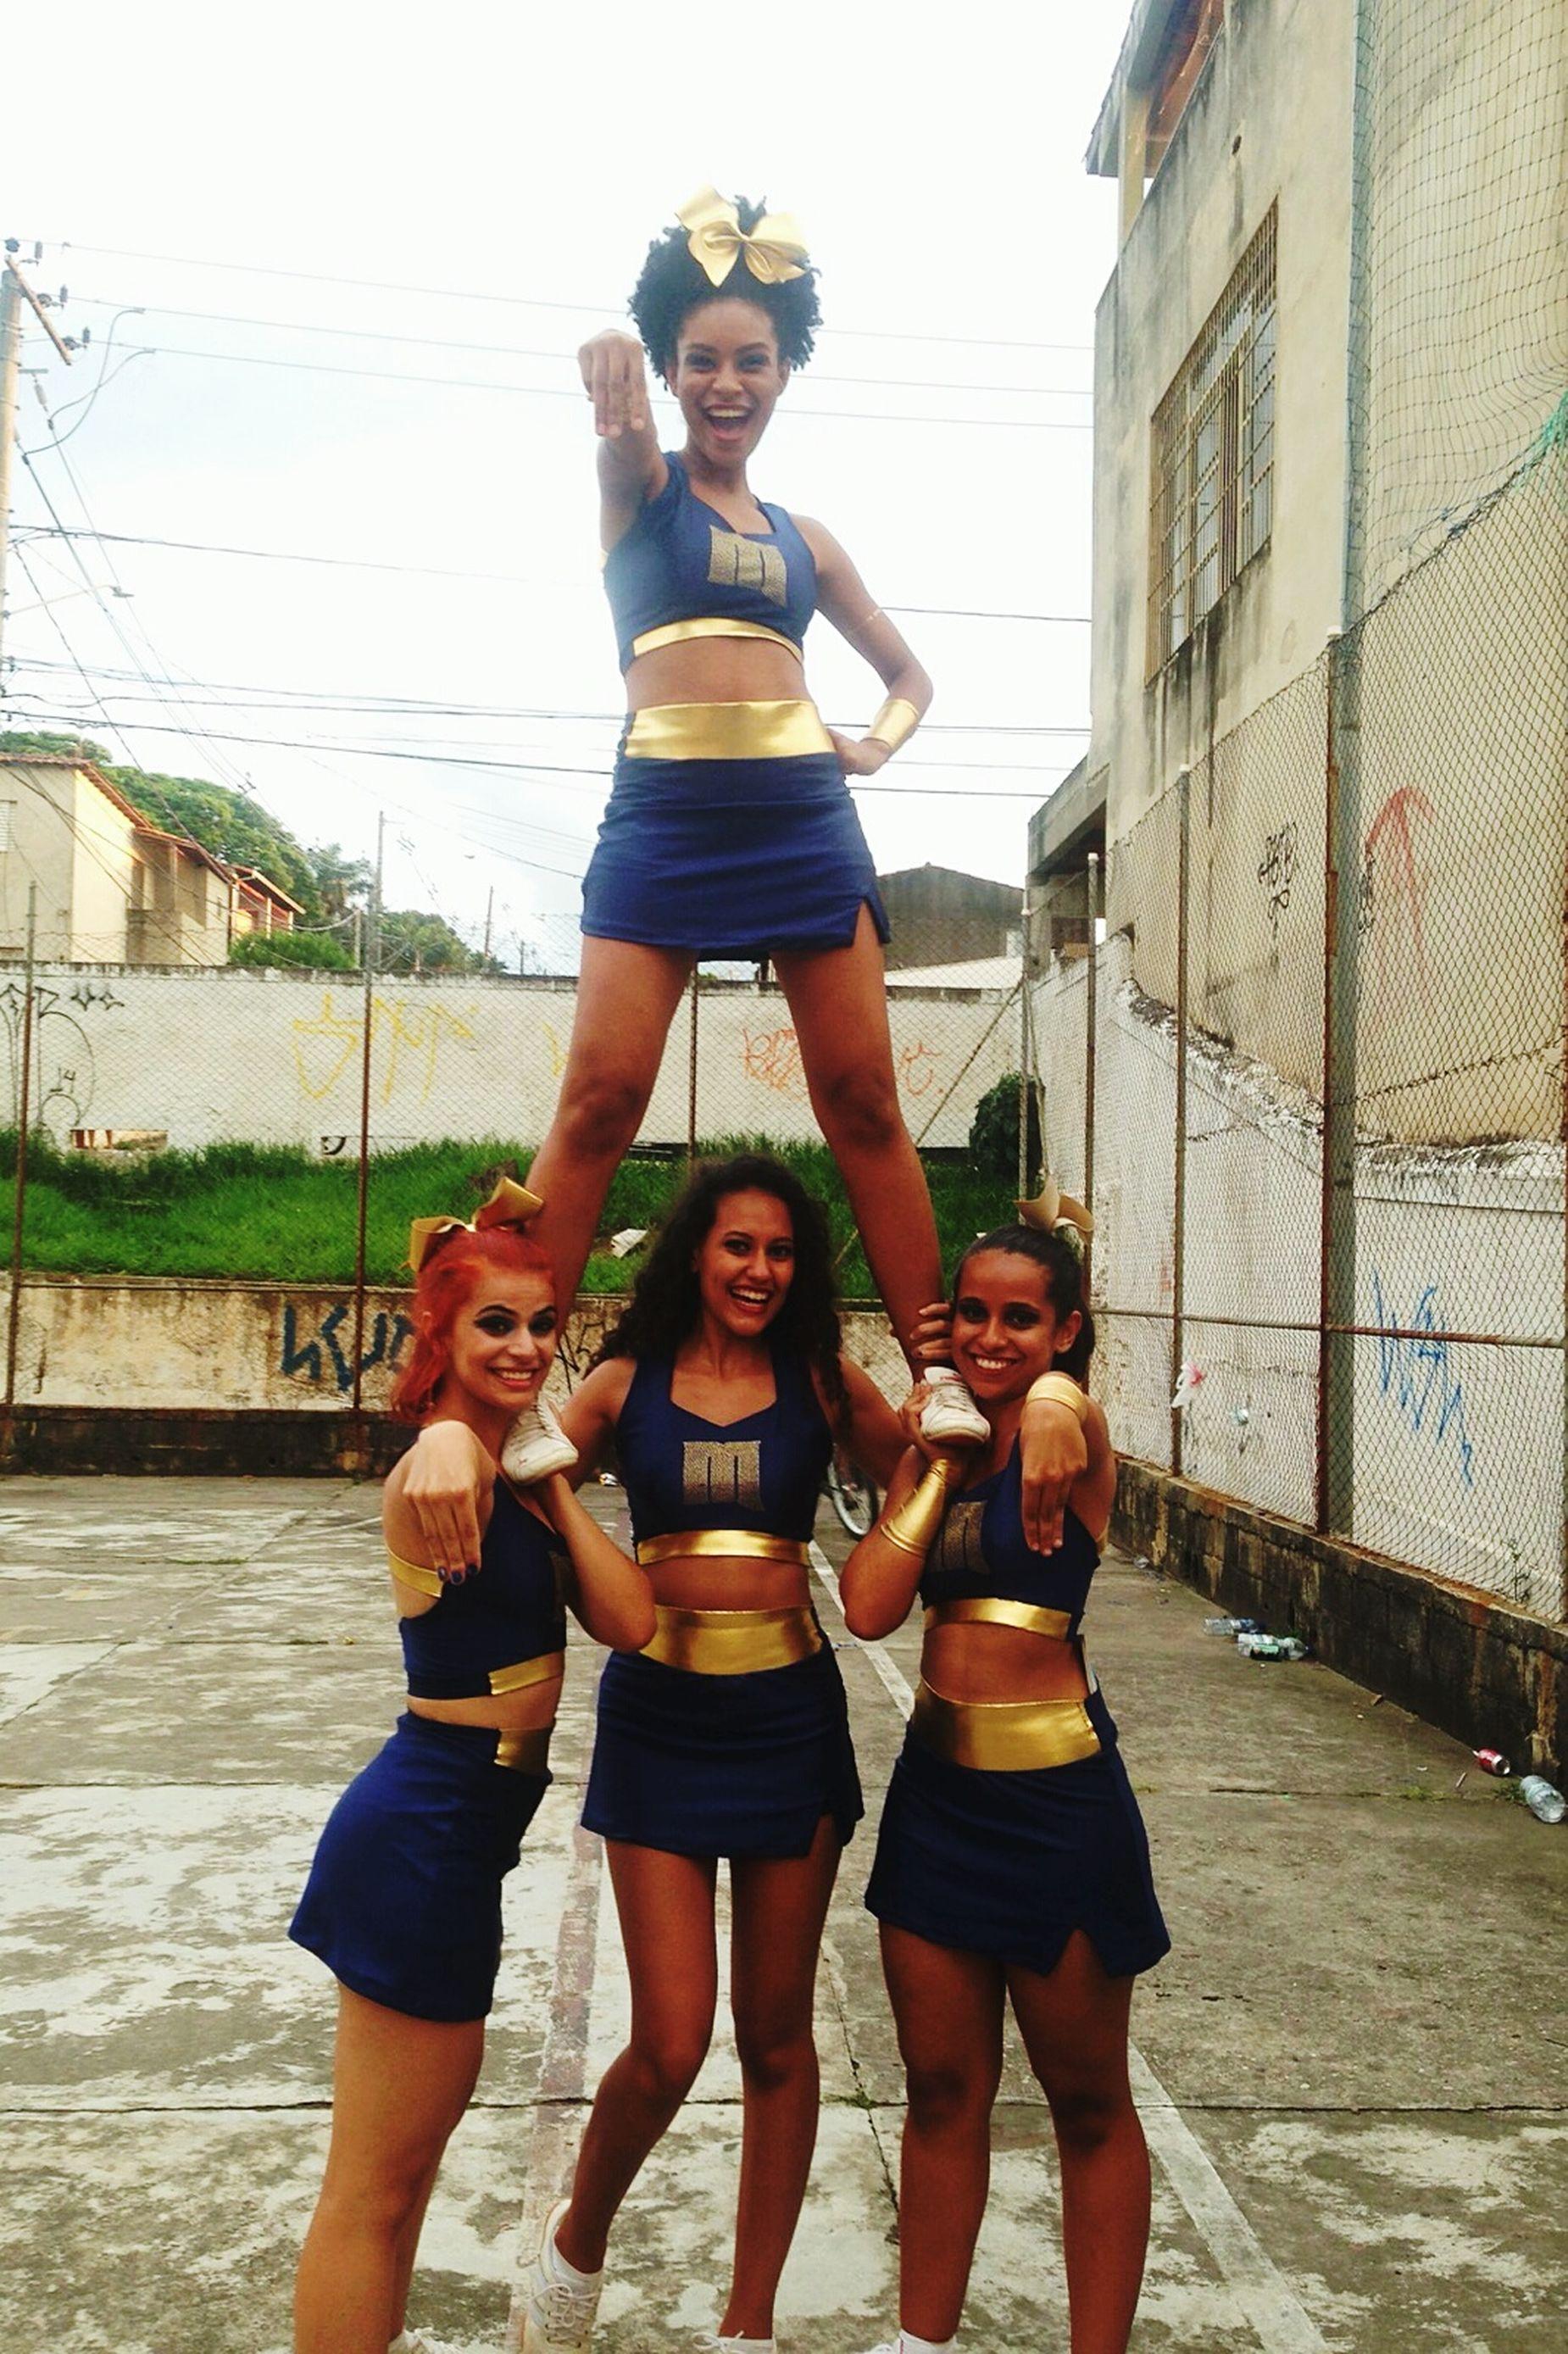 Cheerleader Cheerleading Allgirls Brazil Minervas Ufrj Nacional